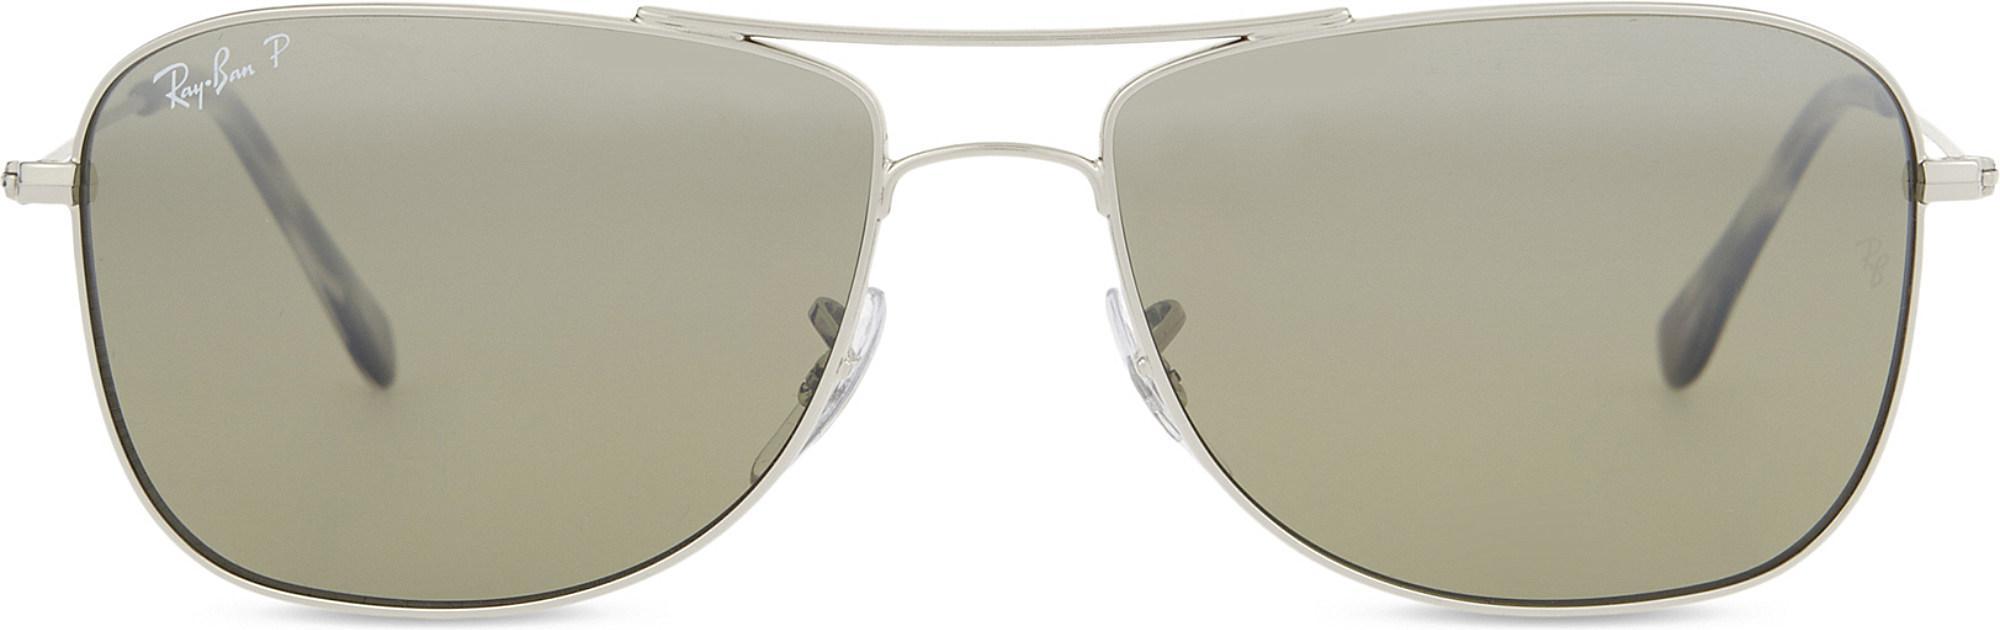 dfbe8ea8493 Ray-Ban Rb3543 Chromance Aviator Sunglasses in Metallic for Men - Lyst